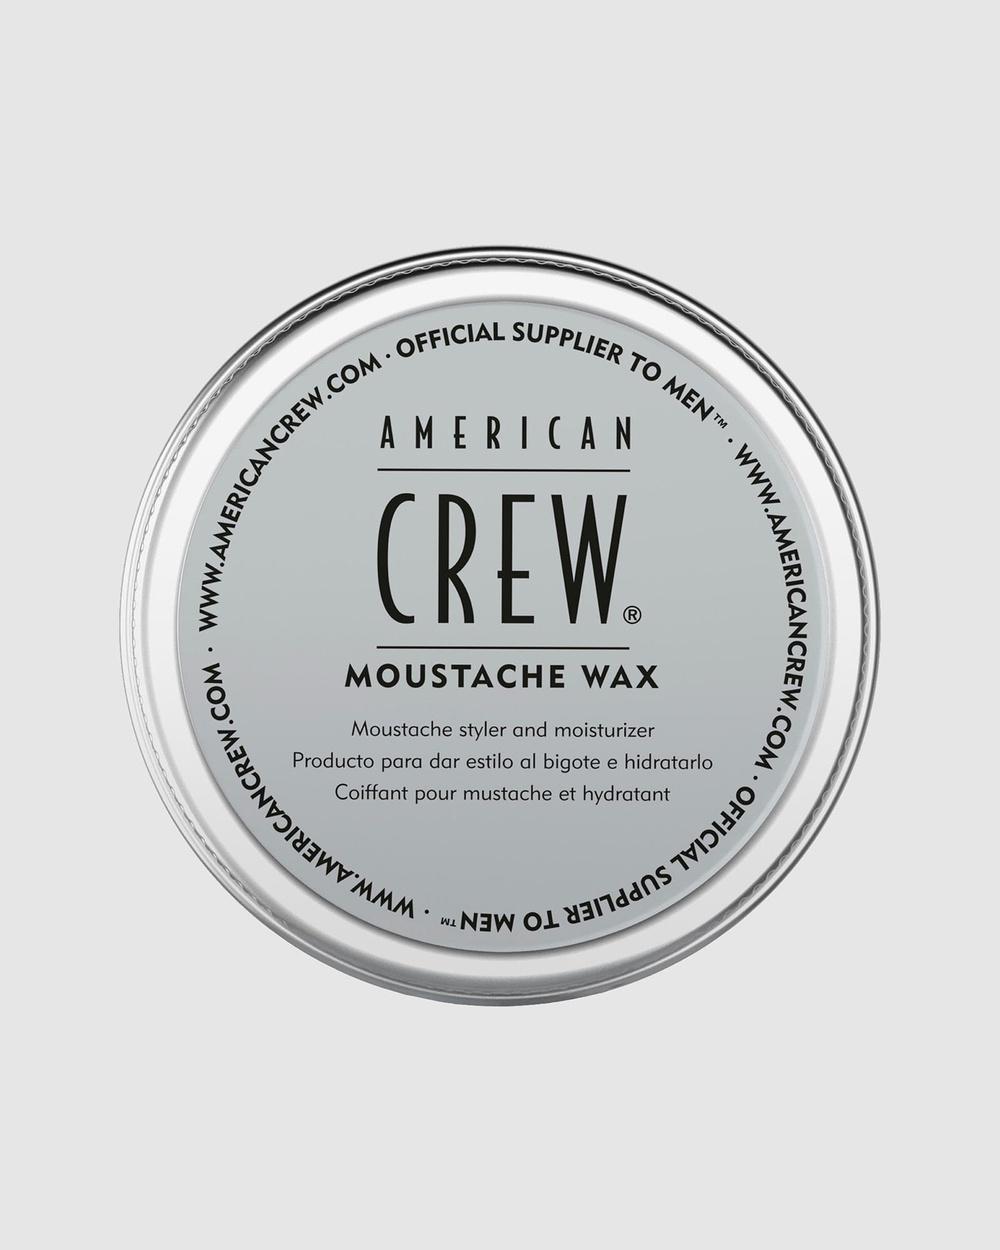 American Crew Moustache Wax 15g Beard N/A